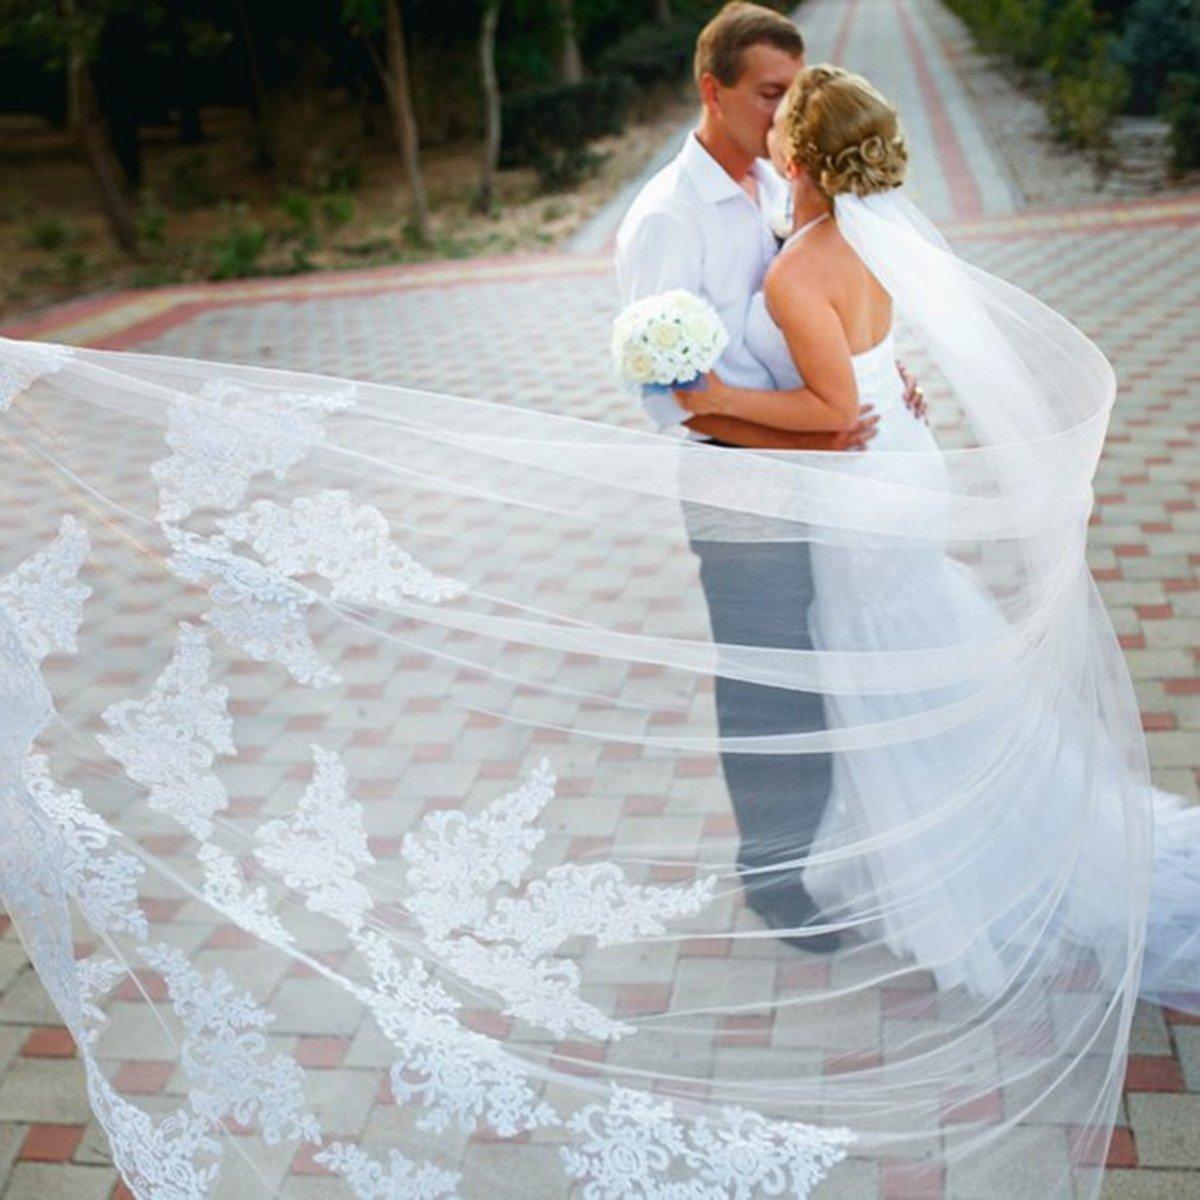 Single Layer Wedding Veil Lianshi Bridal Veil Lace Embroidery Bride Supplies 3m (White) HSTS-B